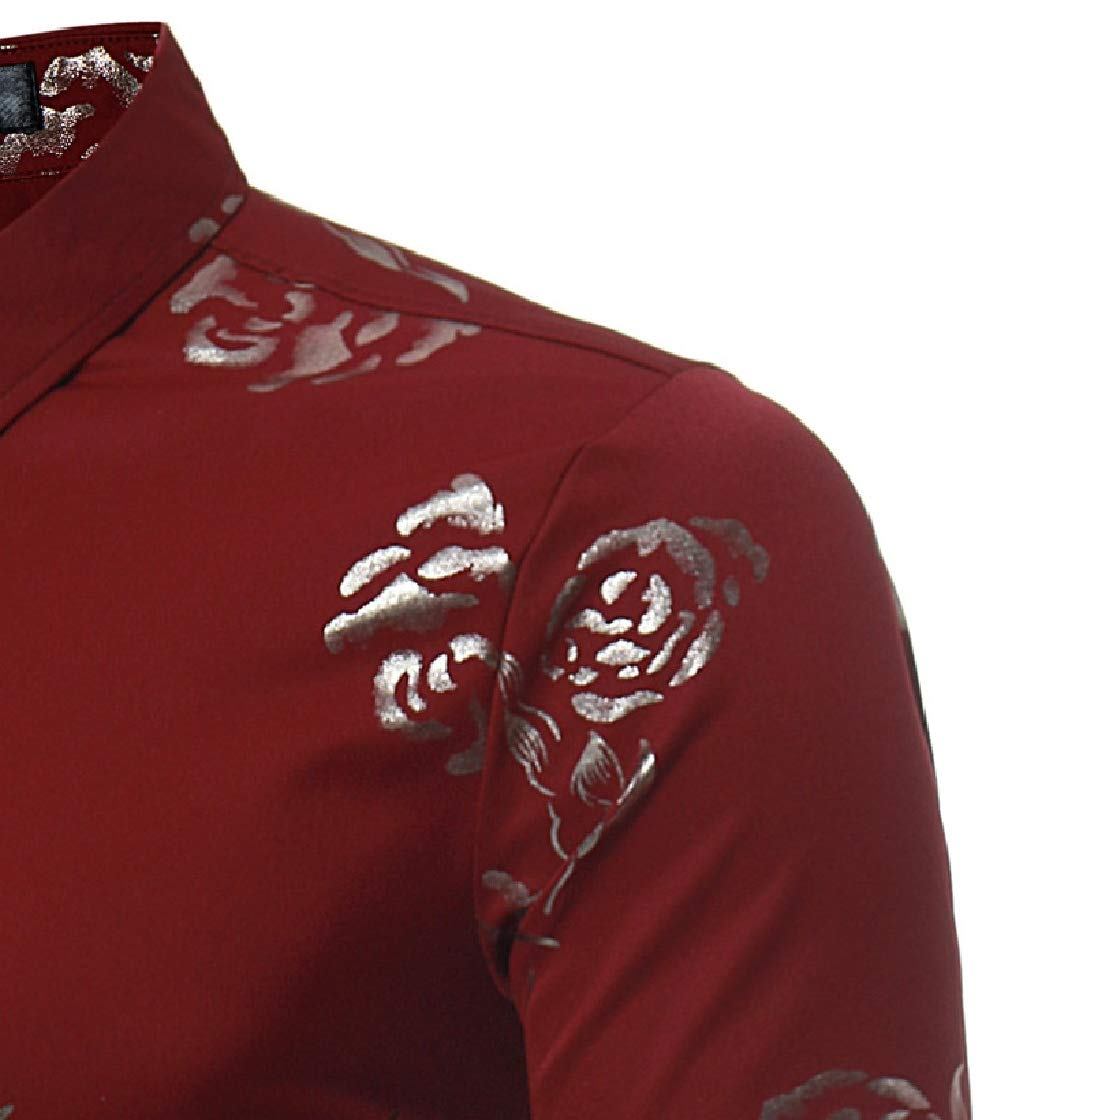 YUNY Mens Britain Regular-Fit Long-Sleeve Rose Fall /& Winter Printed Longshirt Wine Red L